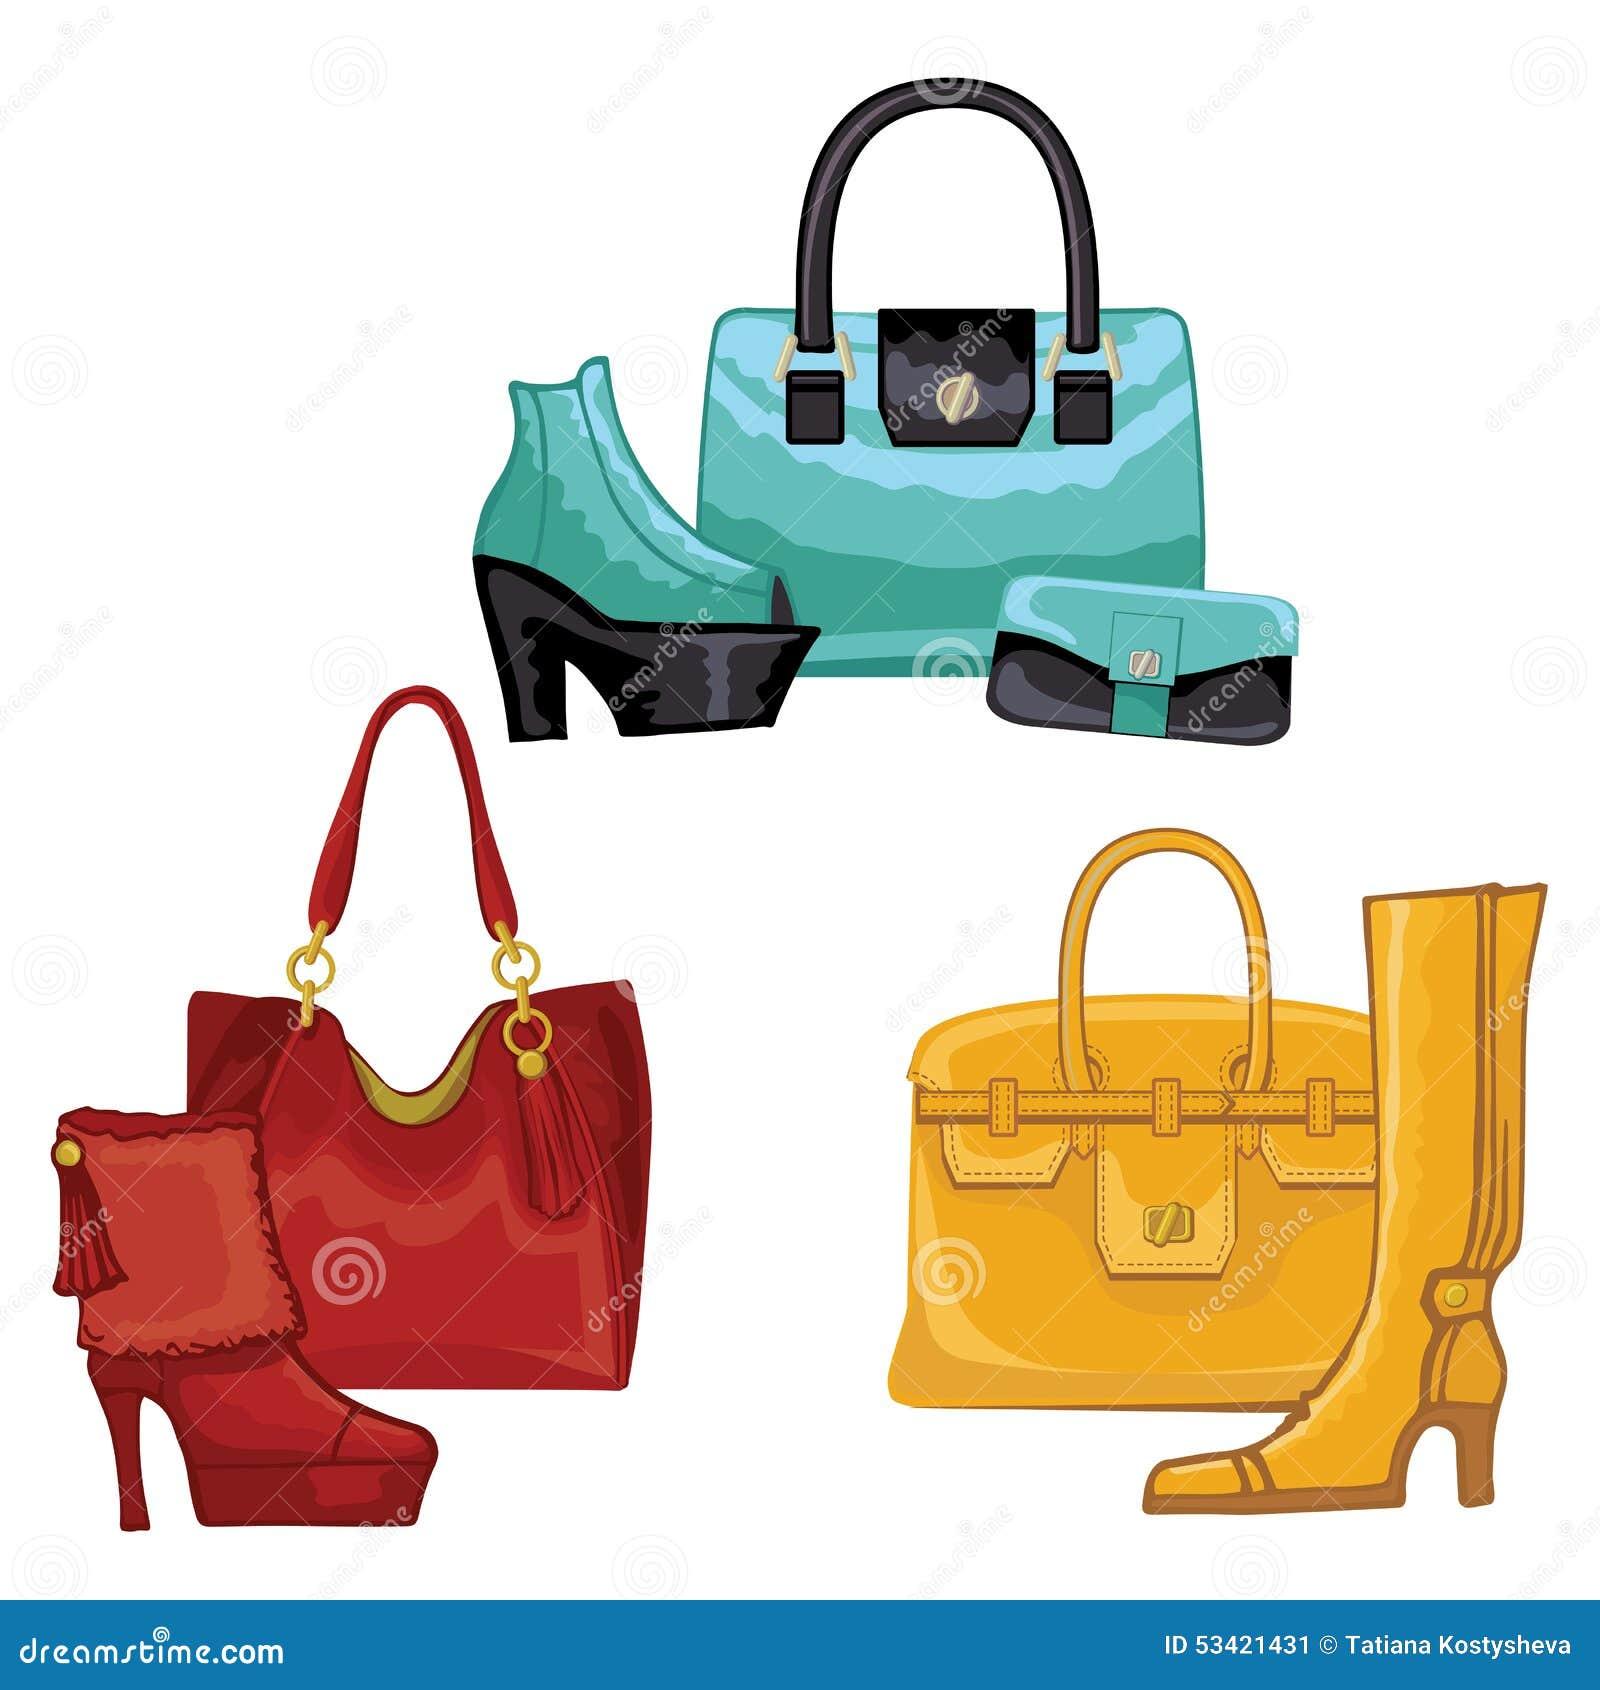 les bottes des femmes color es la mode chaussures sacs. Black Bedroom Furniture Sets. Home Design Ideas